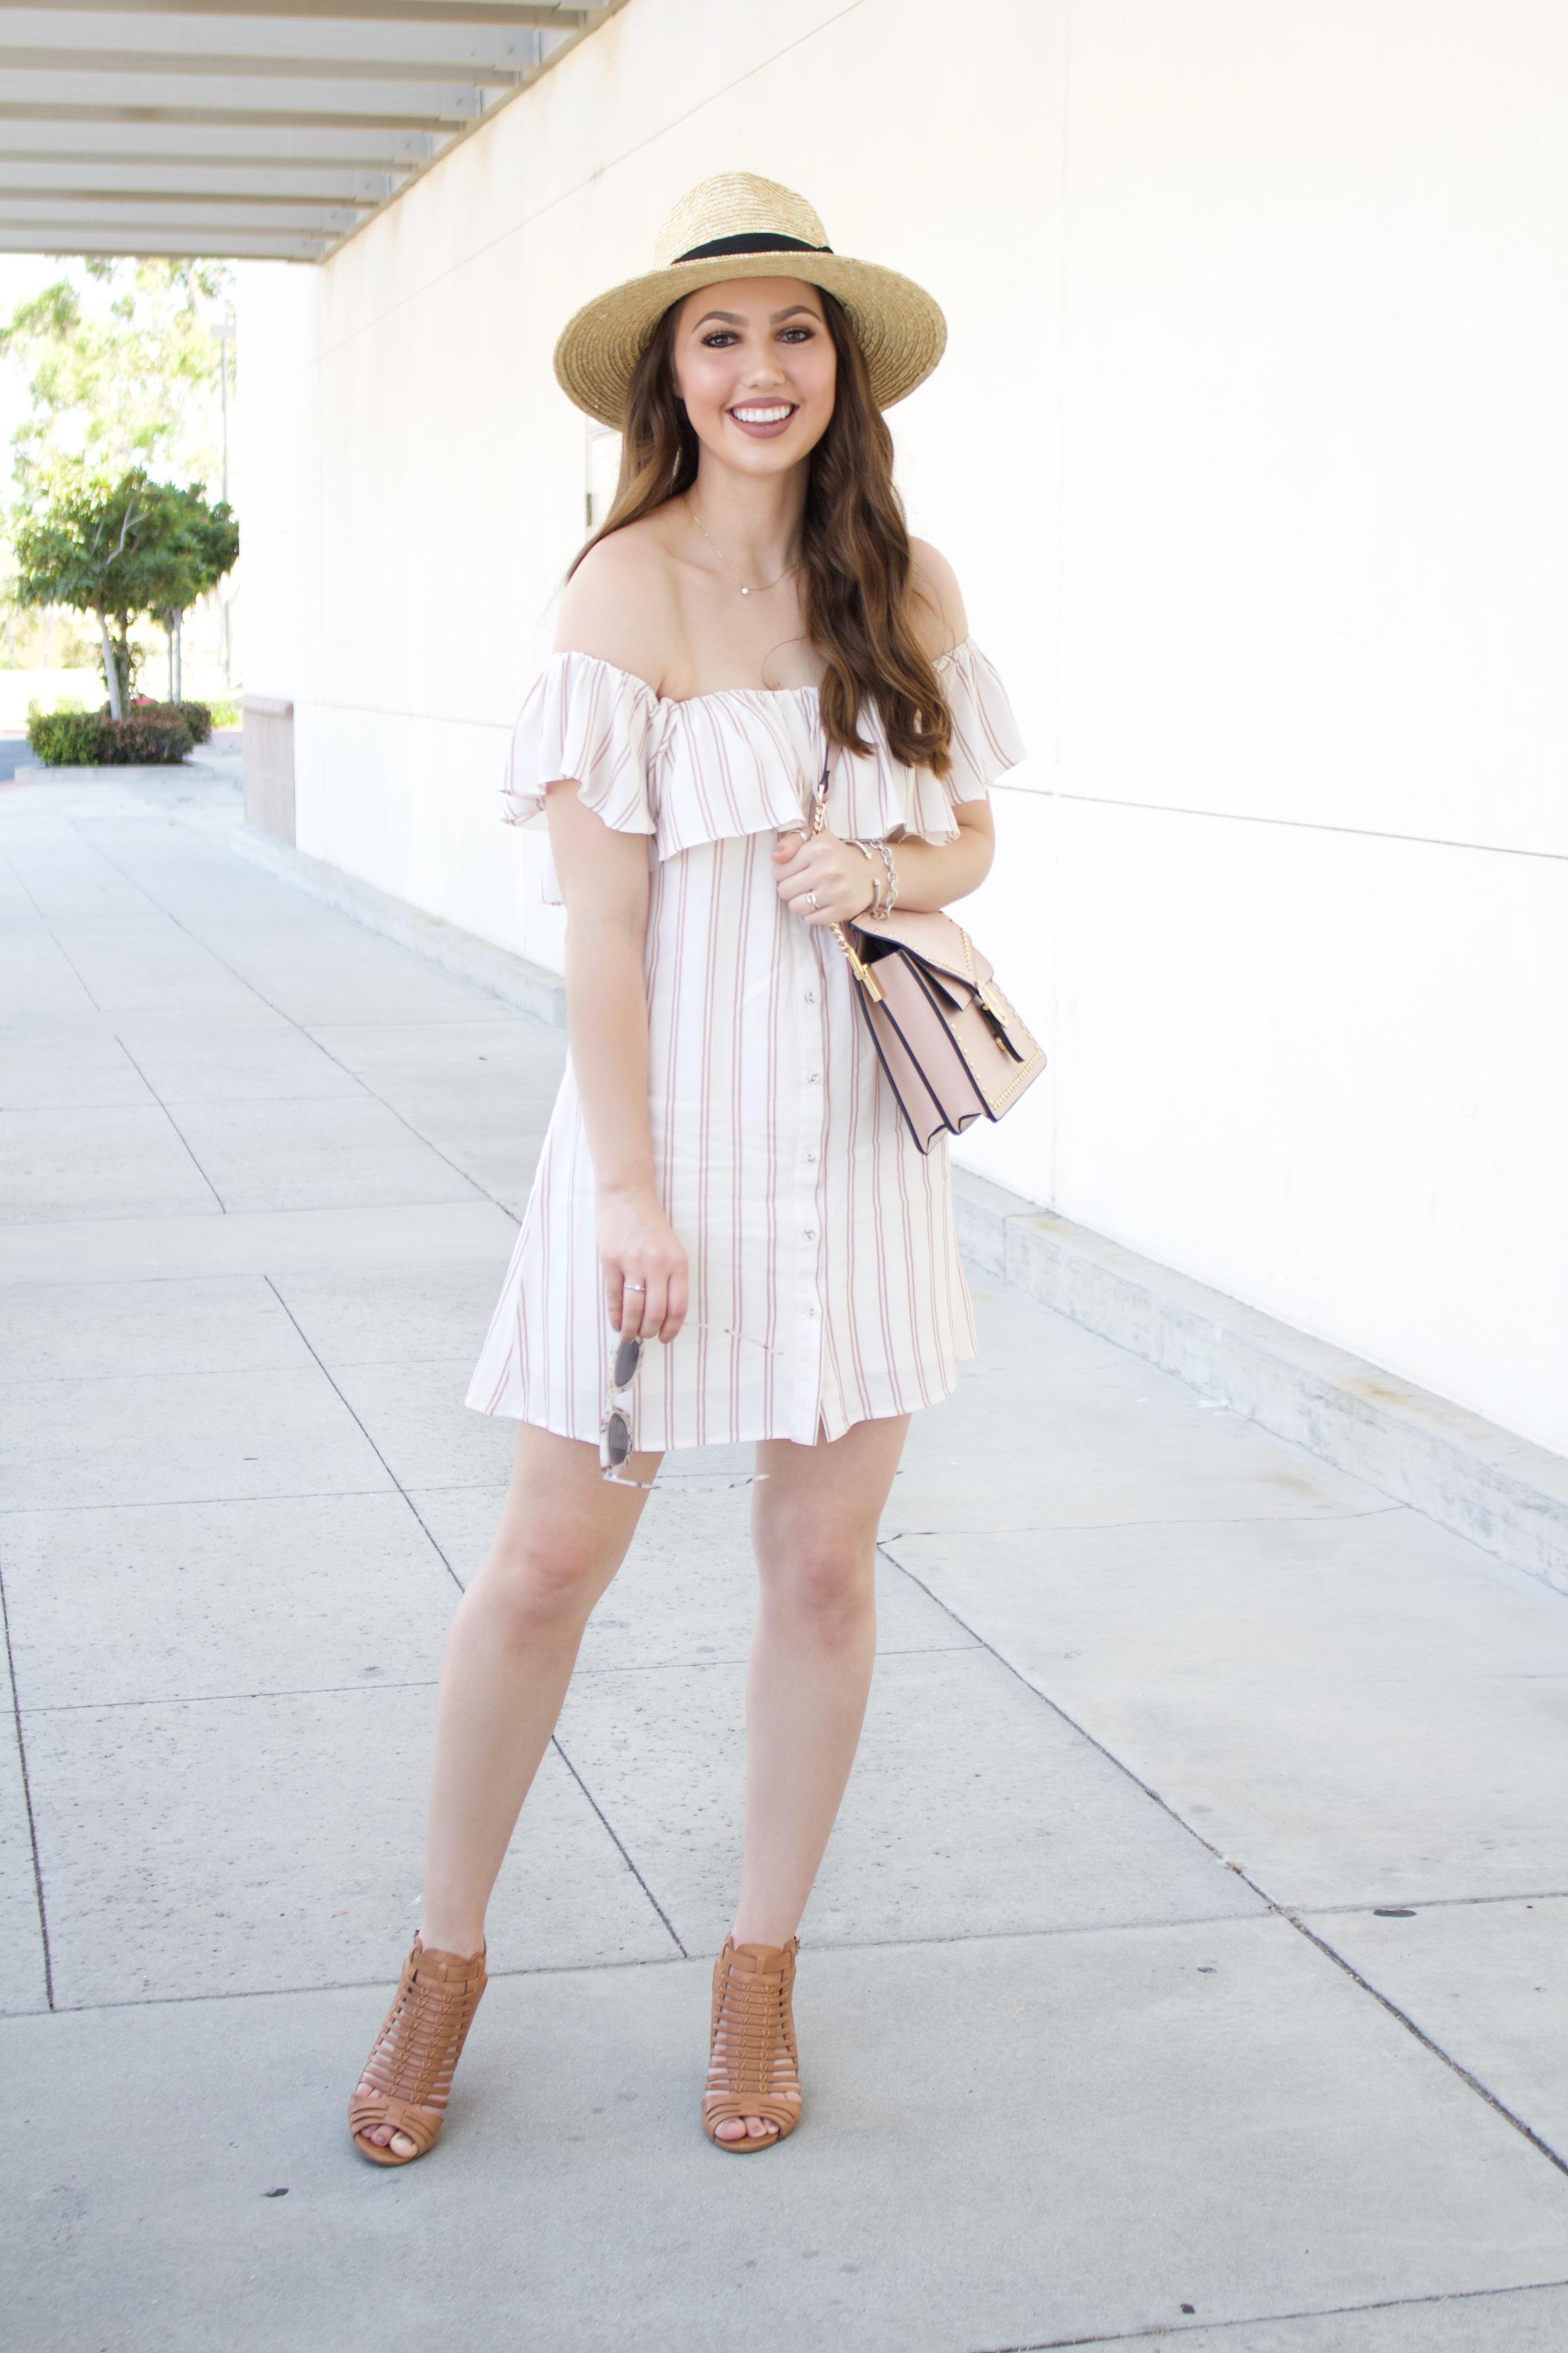 brunch outfit summer